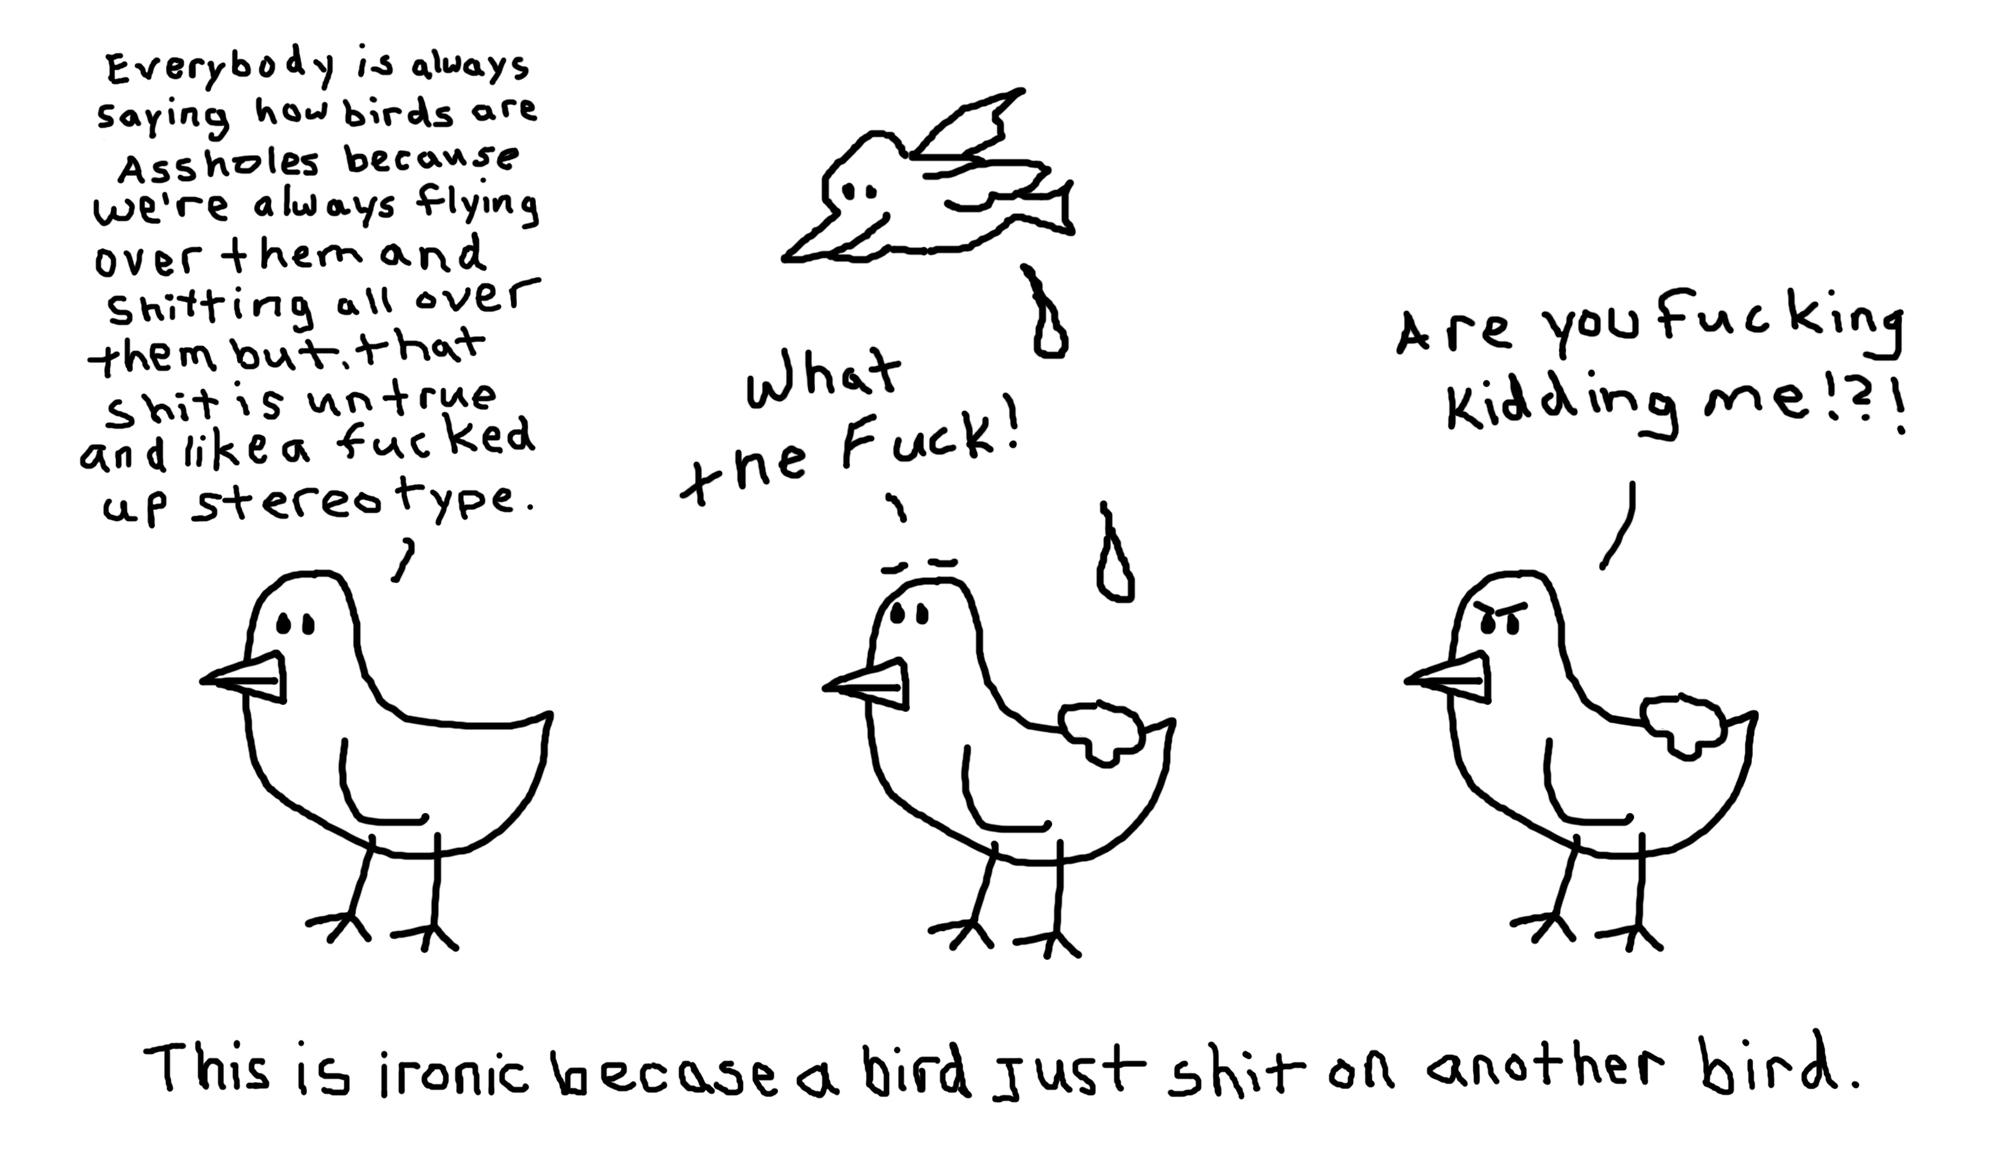 Fucked up Bird Stereotype